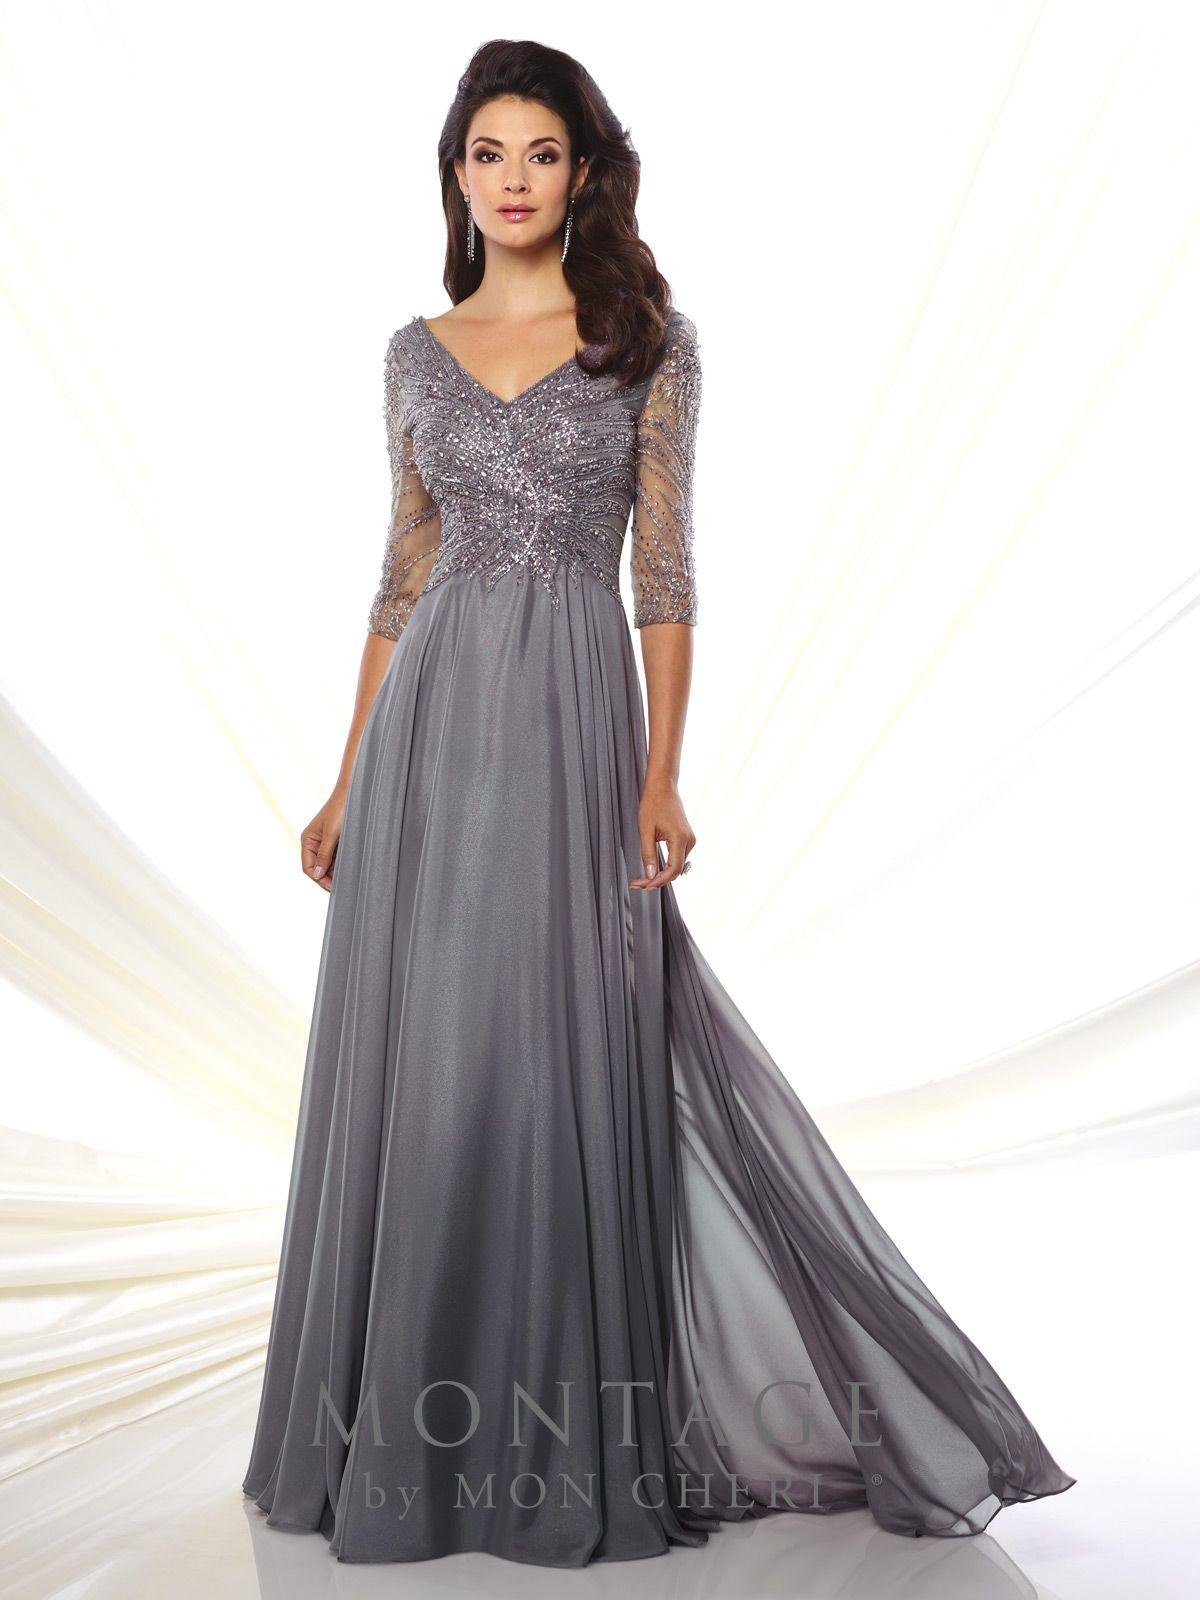 Diamond chiffon aline gown montage by mon cheri formal